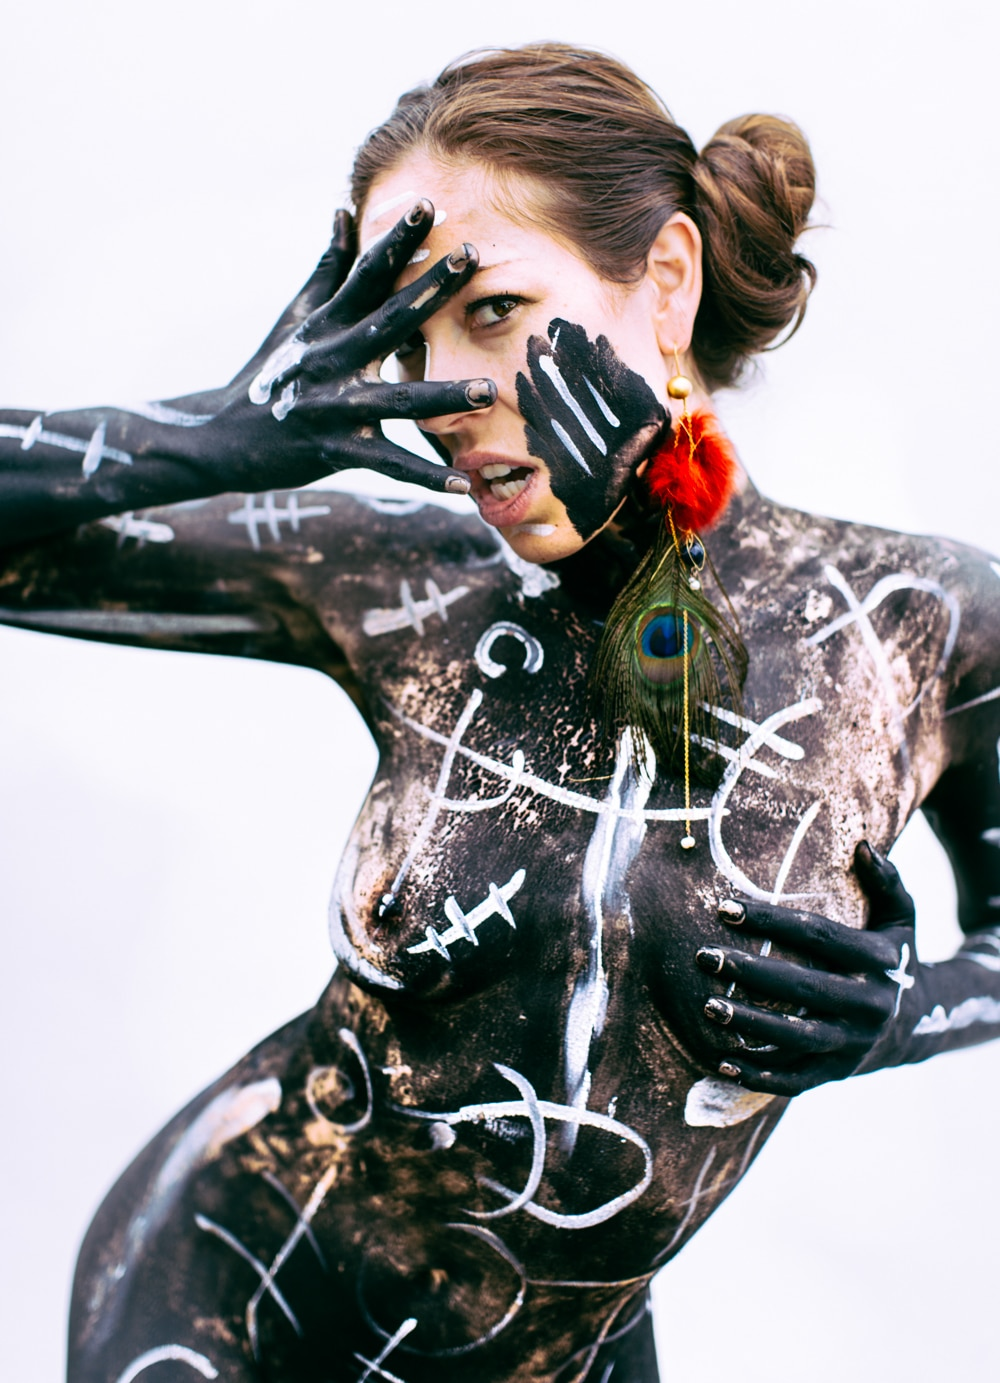 primal_fashion_by_gregory_beylerian-8